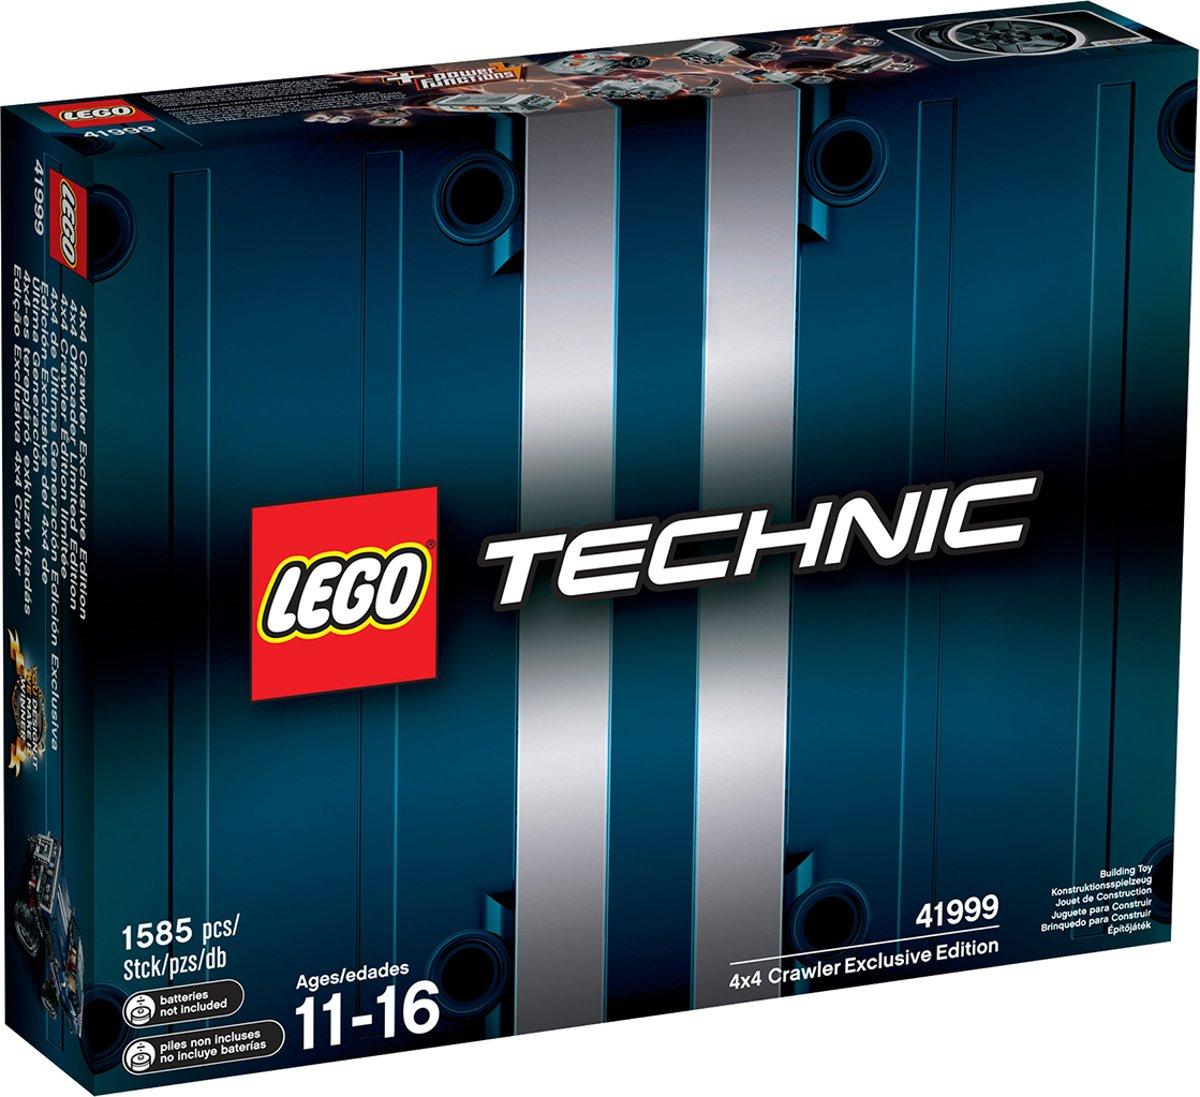 LEGO 41999 4 x 4 Crawler Exclusive Edition